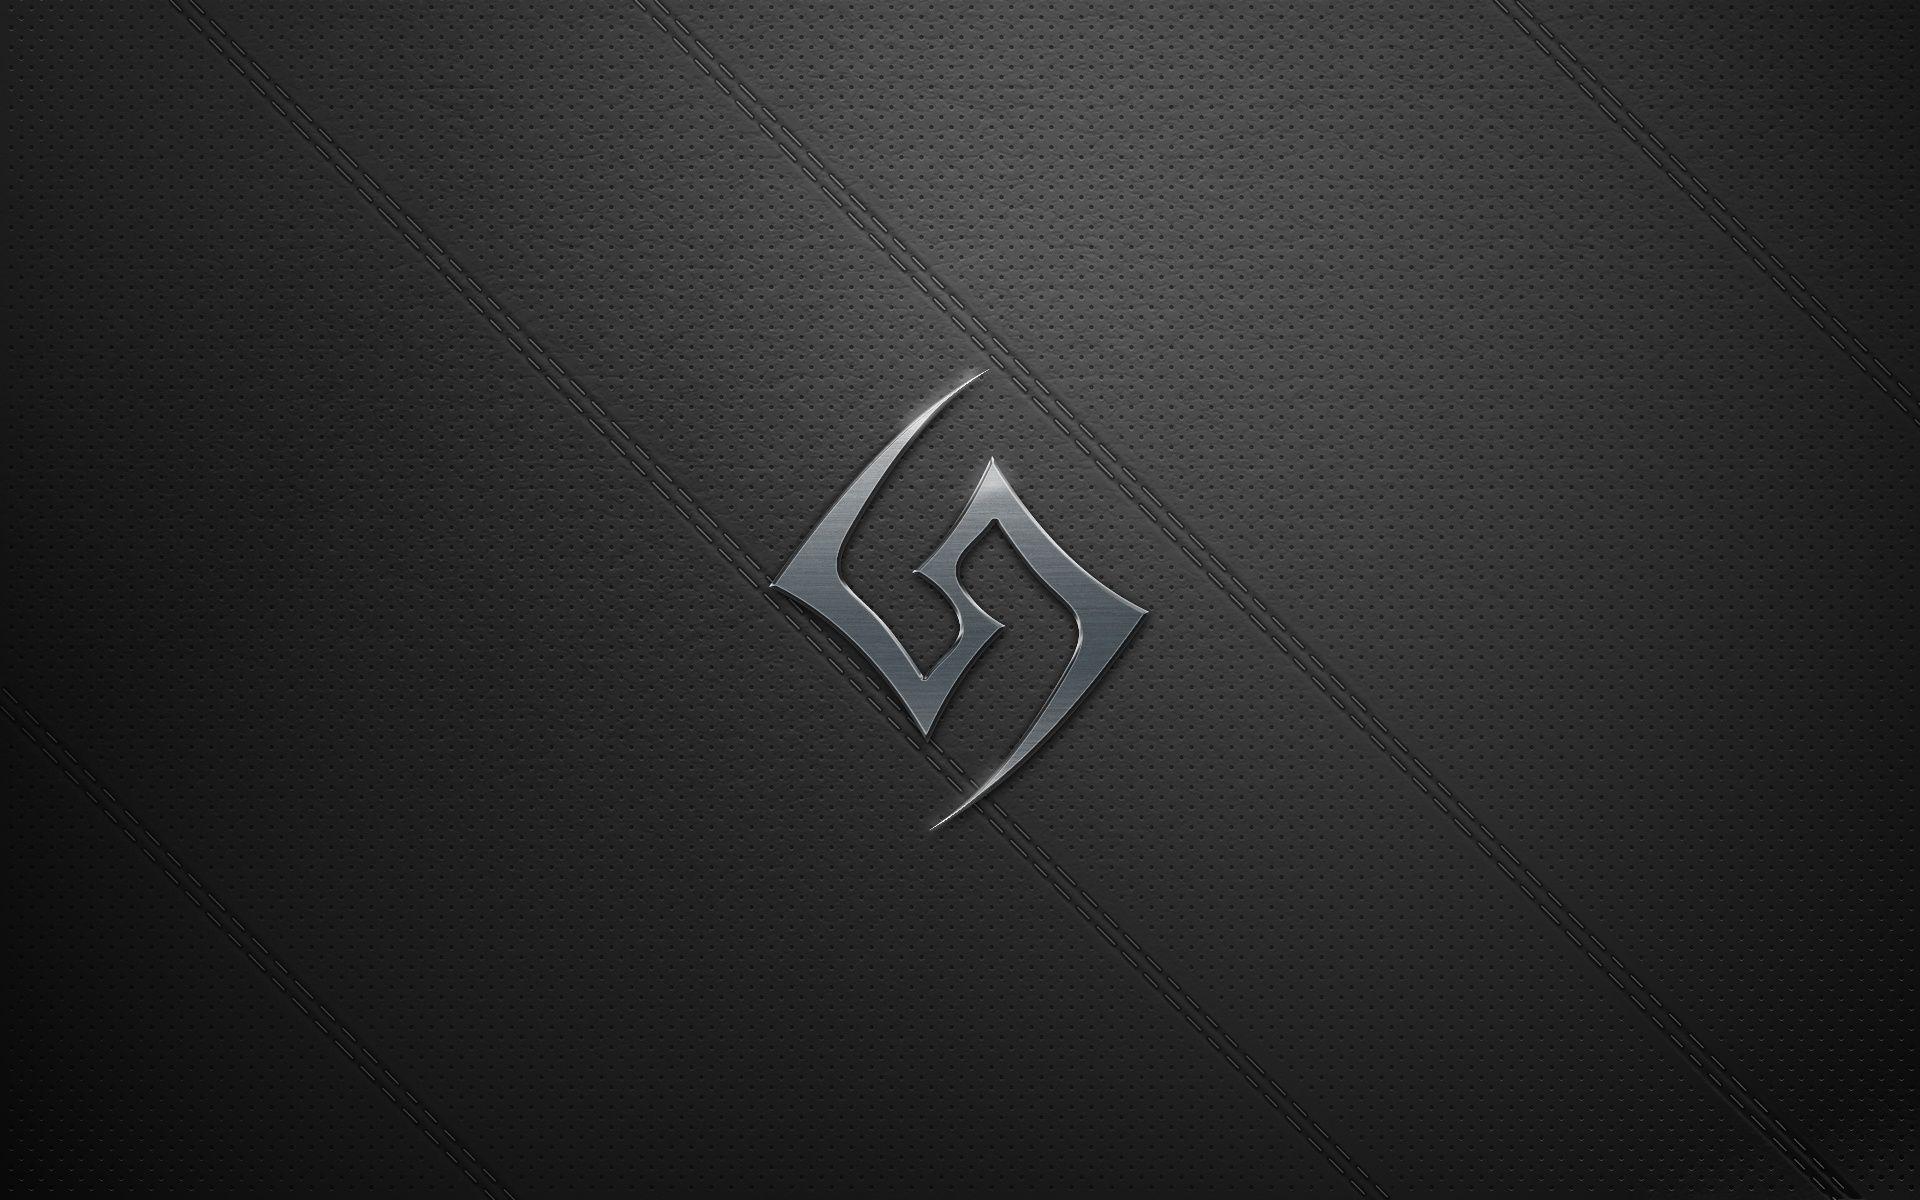 Cool logos wallpapers wallpaper cave - Gaming logo wallpaper ...